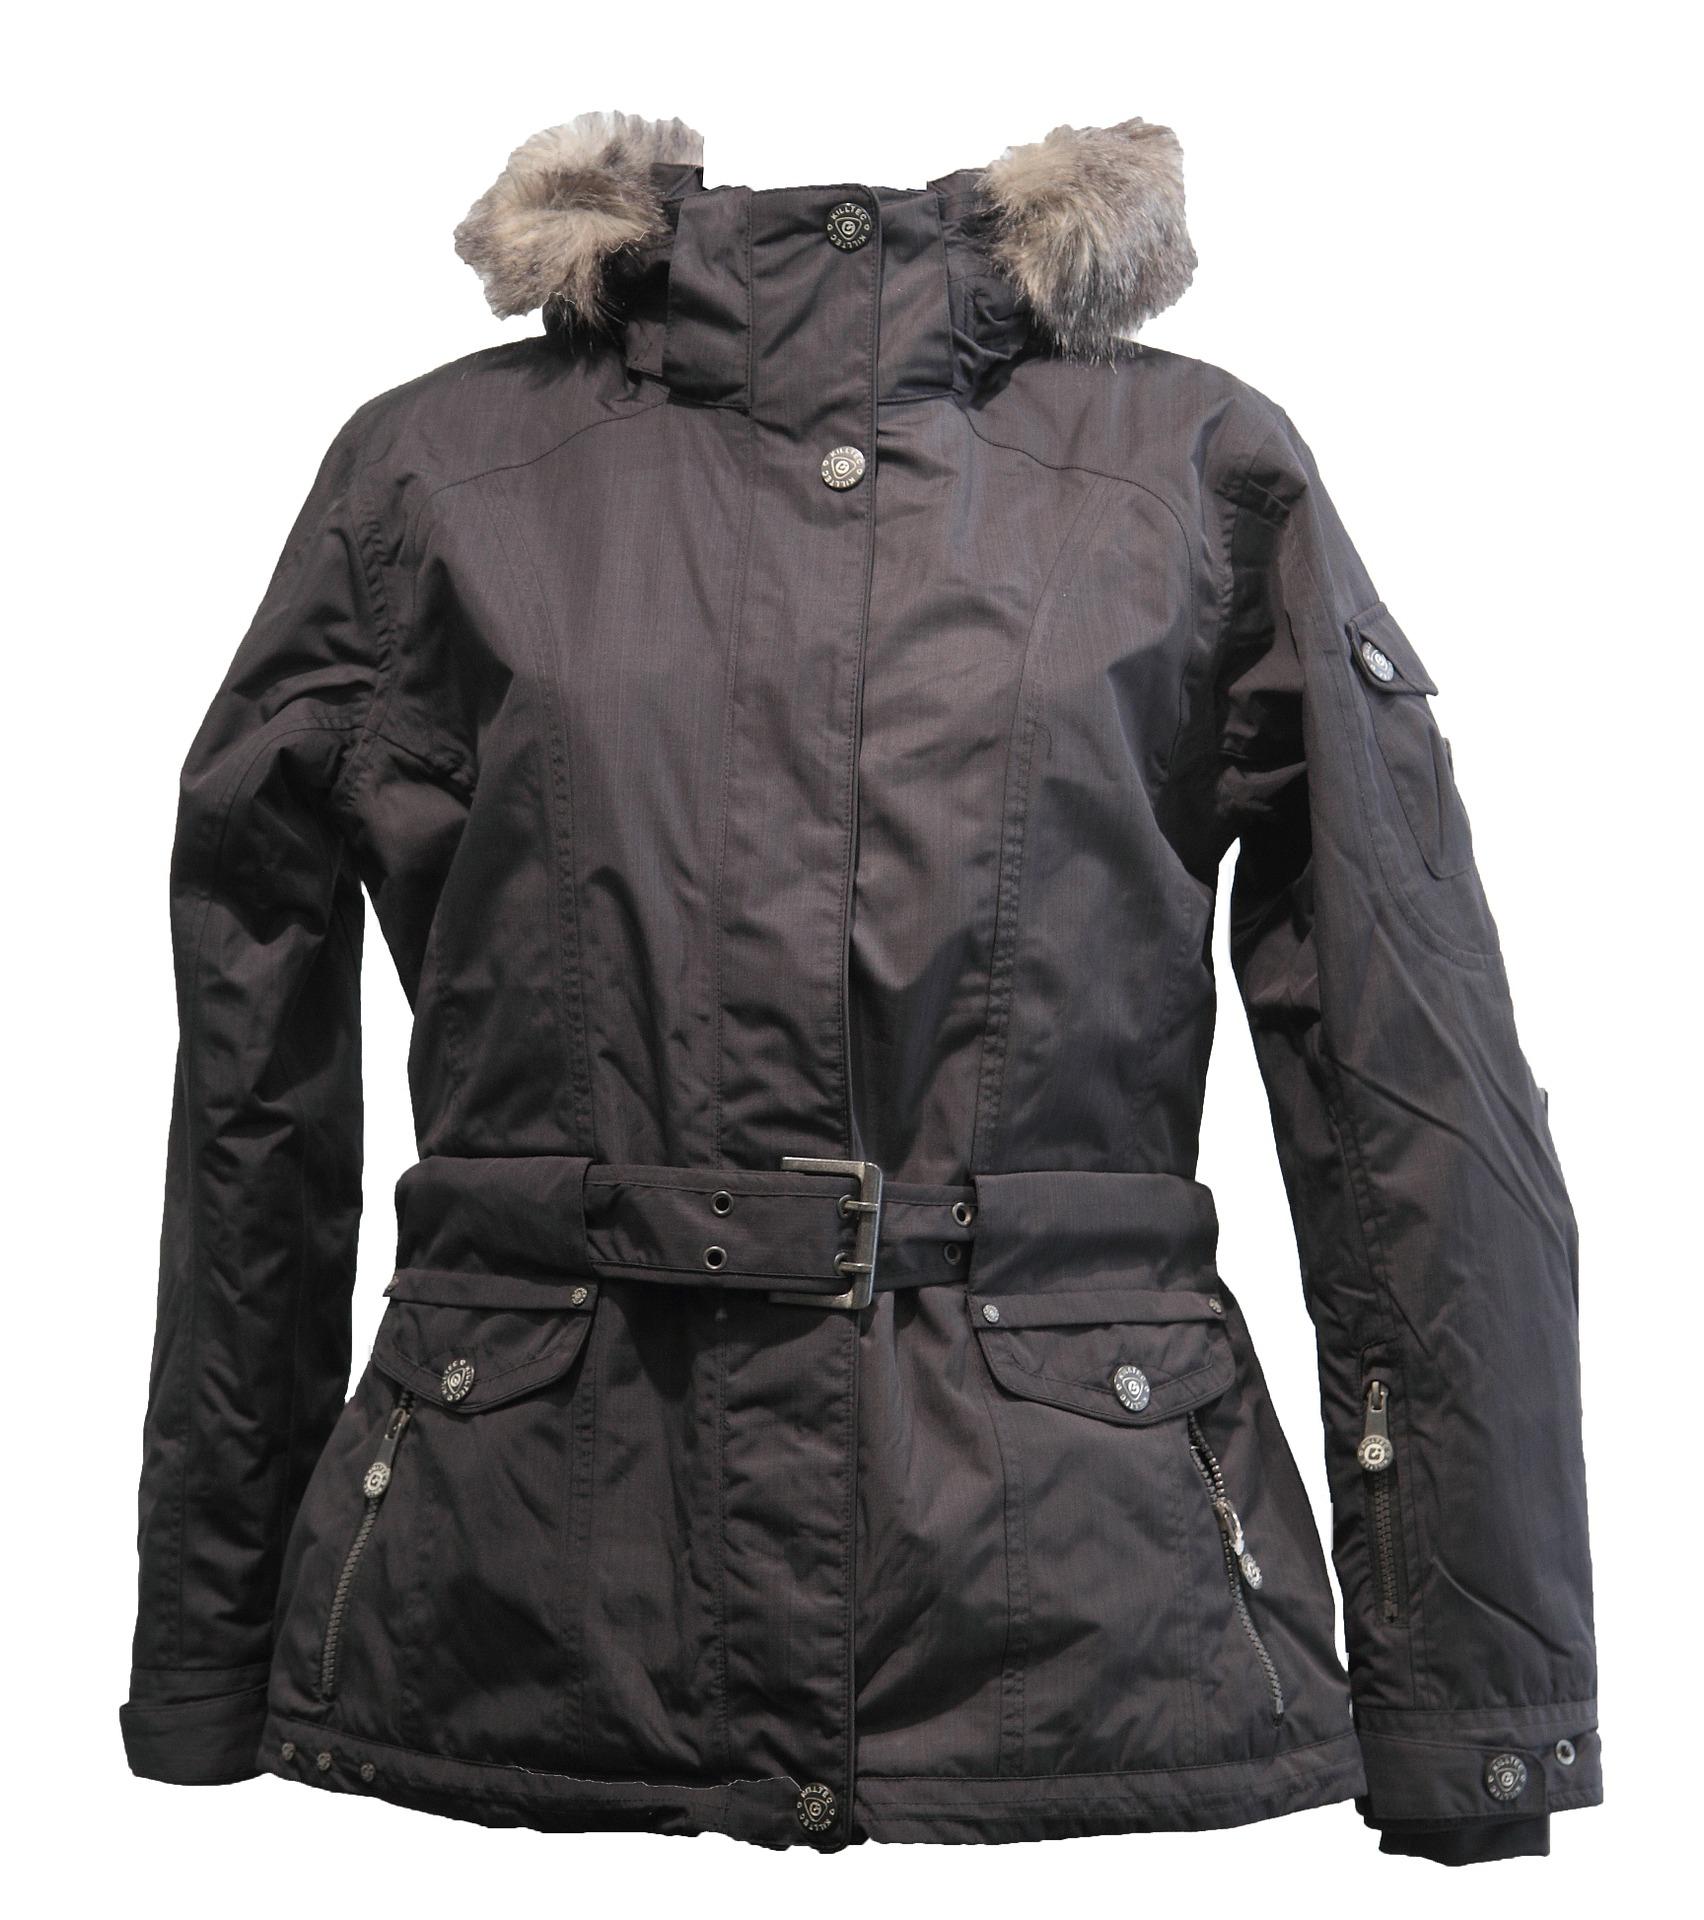 Black WomenSki Jacket